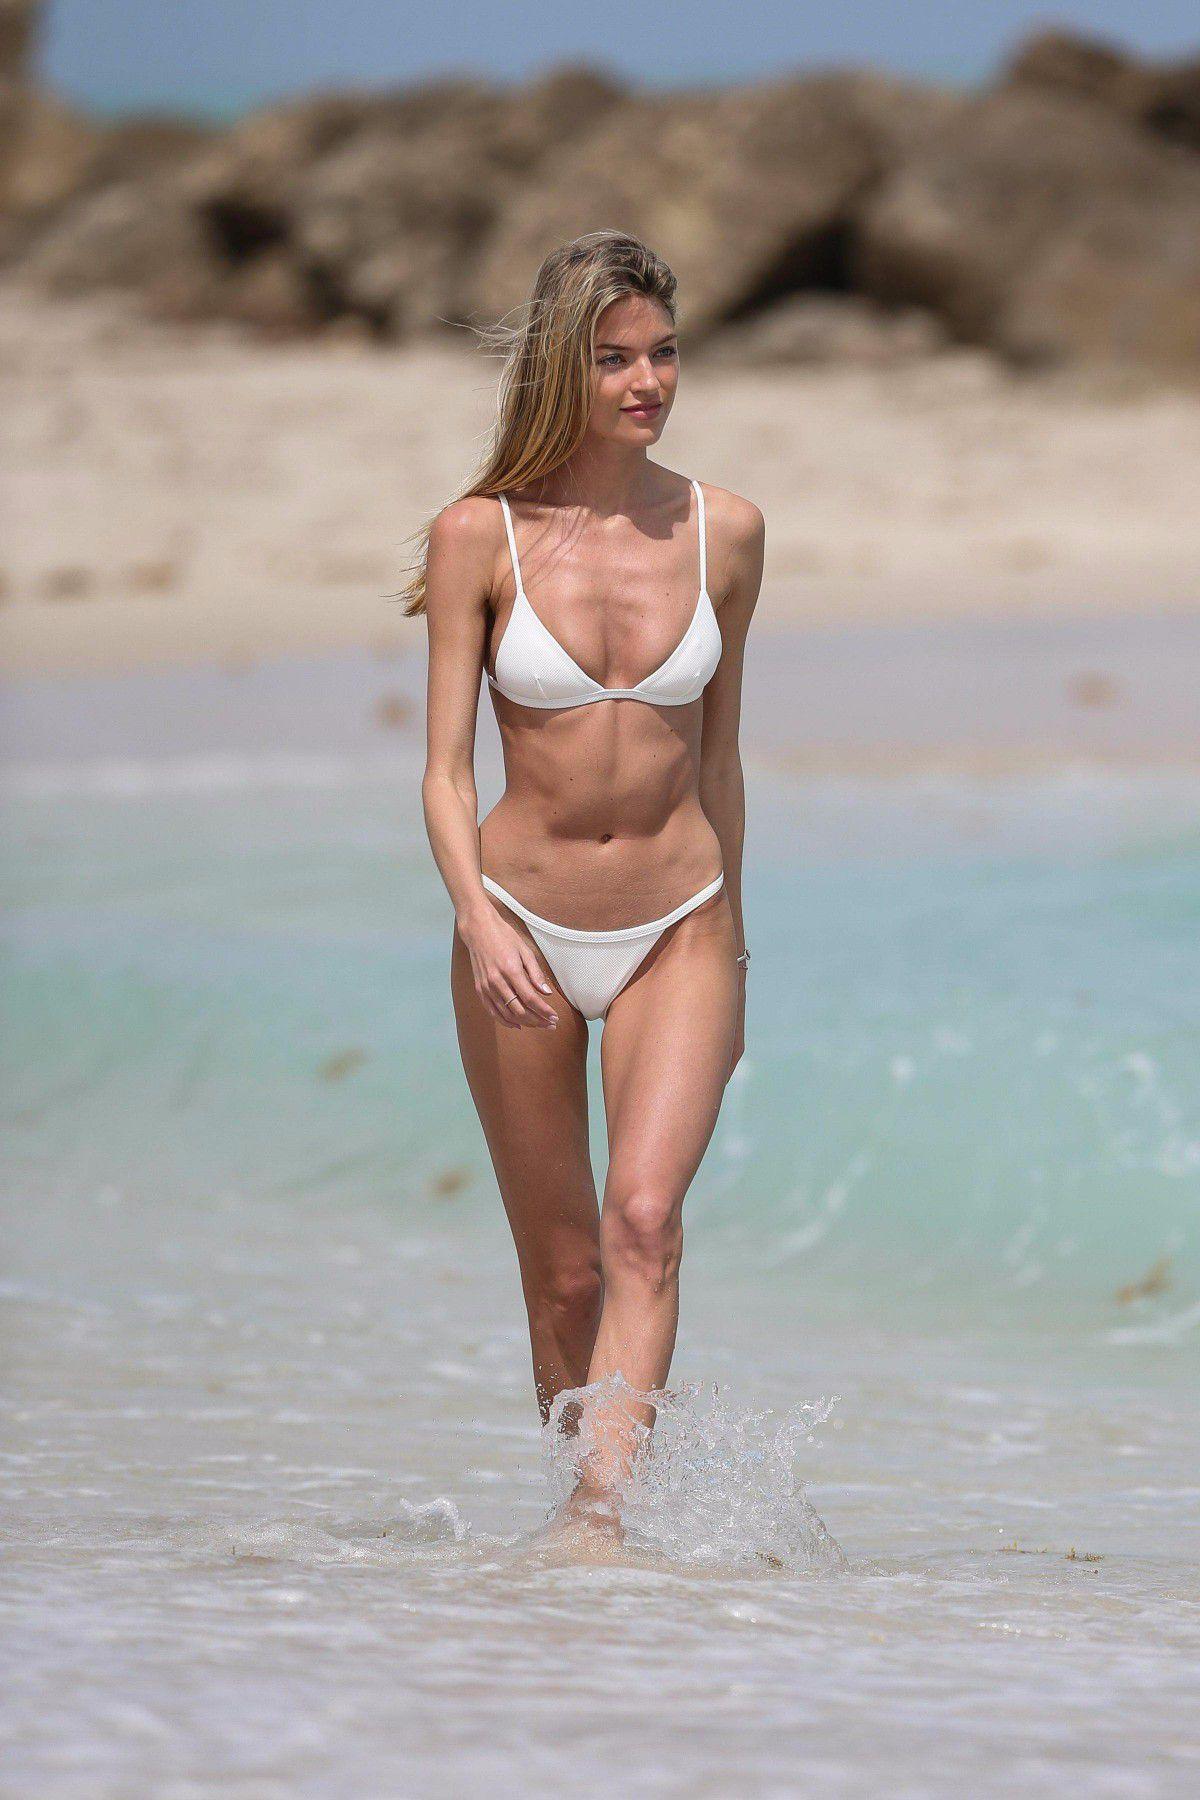 Nude Beach Cougar